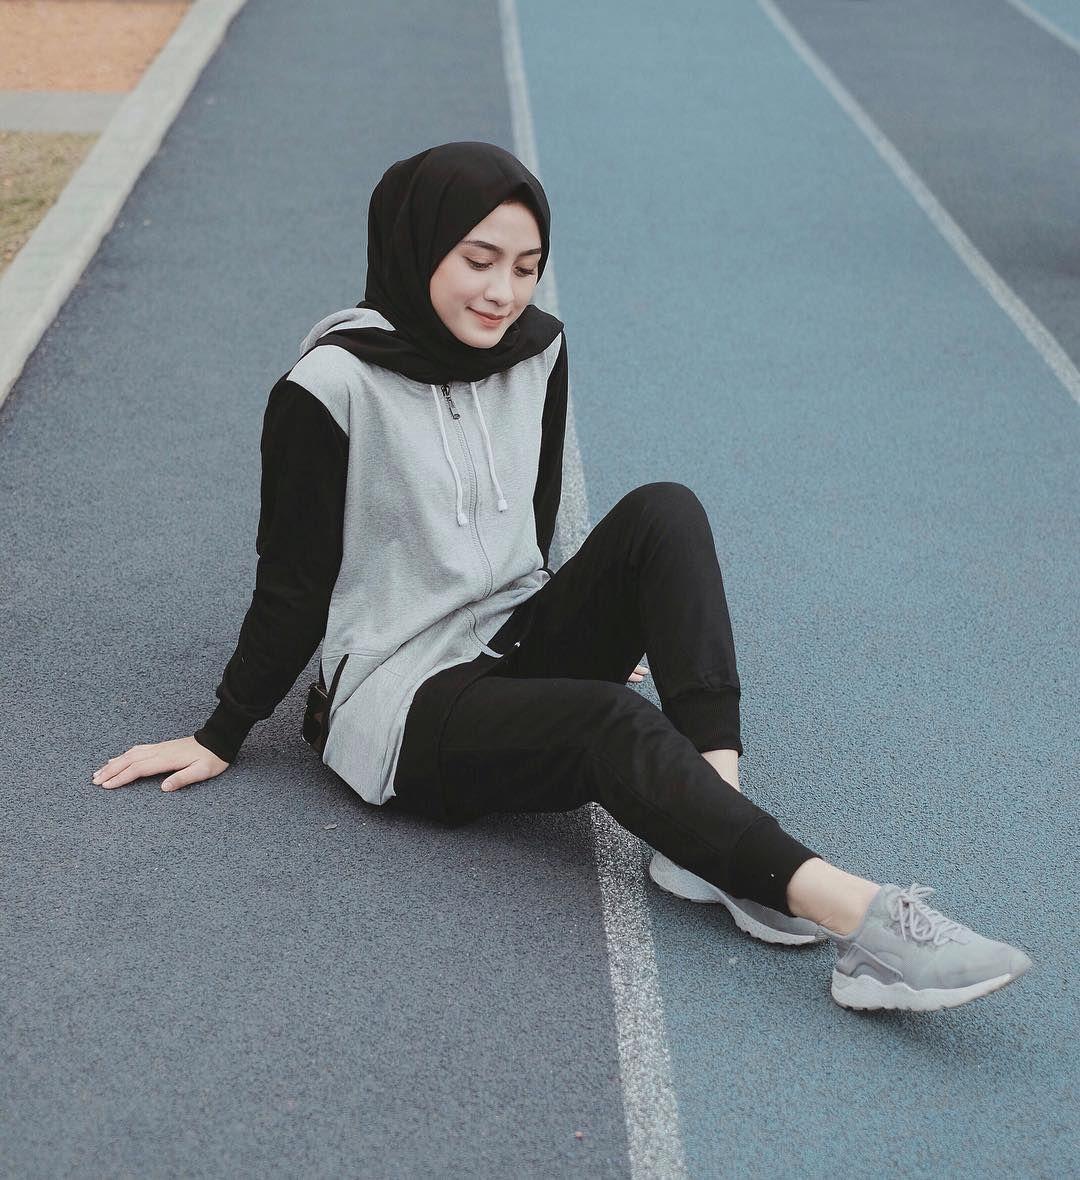 Sport Fashion For Hijab Dengan Gambar Baju Olahraga Wanita Pakaian Olahraga